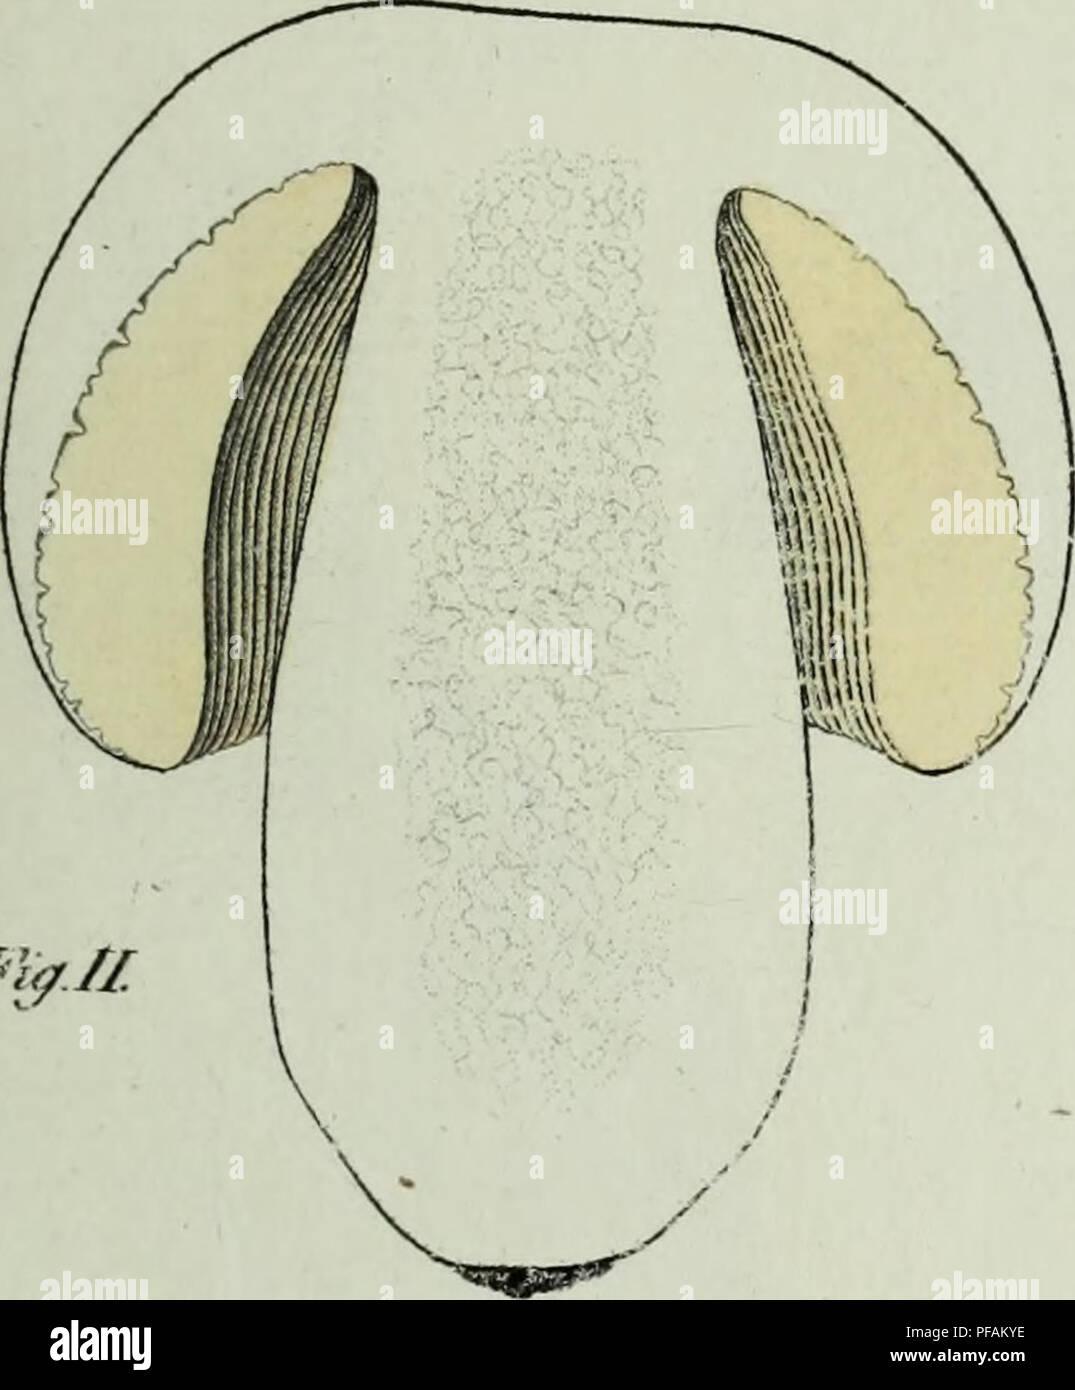 . Descrizione dei funghi mangerecci più comuni dell'Italia e de' velenosi che possono co' medesimi confondersi. Fungi; Mushrooms. Mg.pr W^Sta.. IfyJl. Please note that these images are extracted from scanned page images that may have been digitally enhanced for readability - coloration and appearance of these illustrations may not perfectly resemble the original work.. Vittadini, Carlo; Cavagna Sangiuliani di Gualdana, Antonio, conte, 1843-1913, former owner. IU-R. Milano, Rusconi - Stock Image